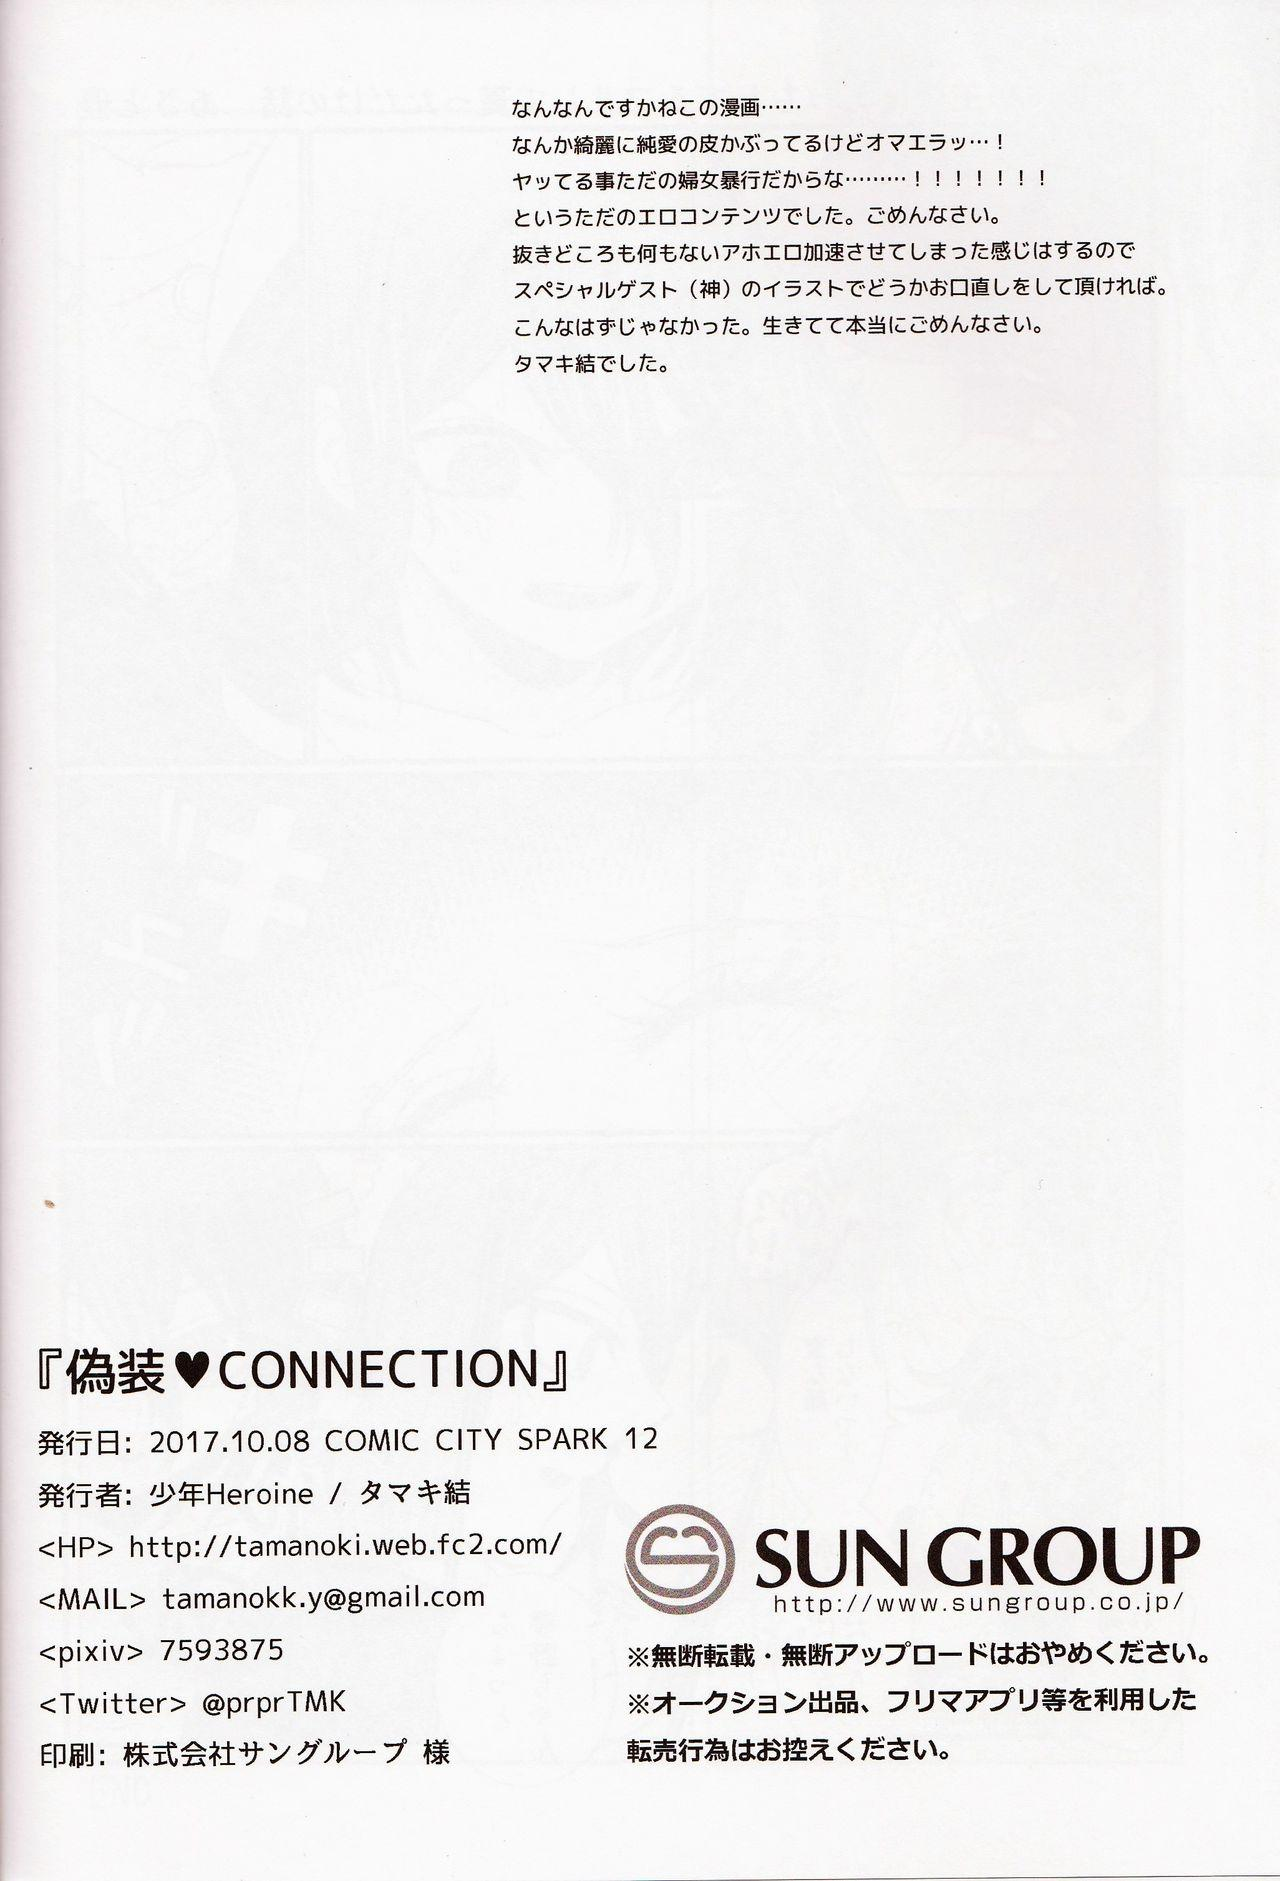 Gisou CONNECTION 28